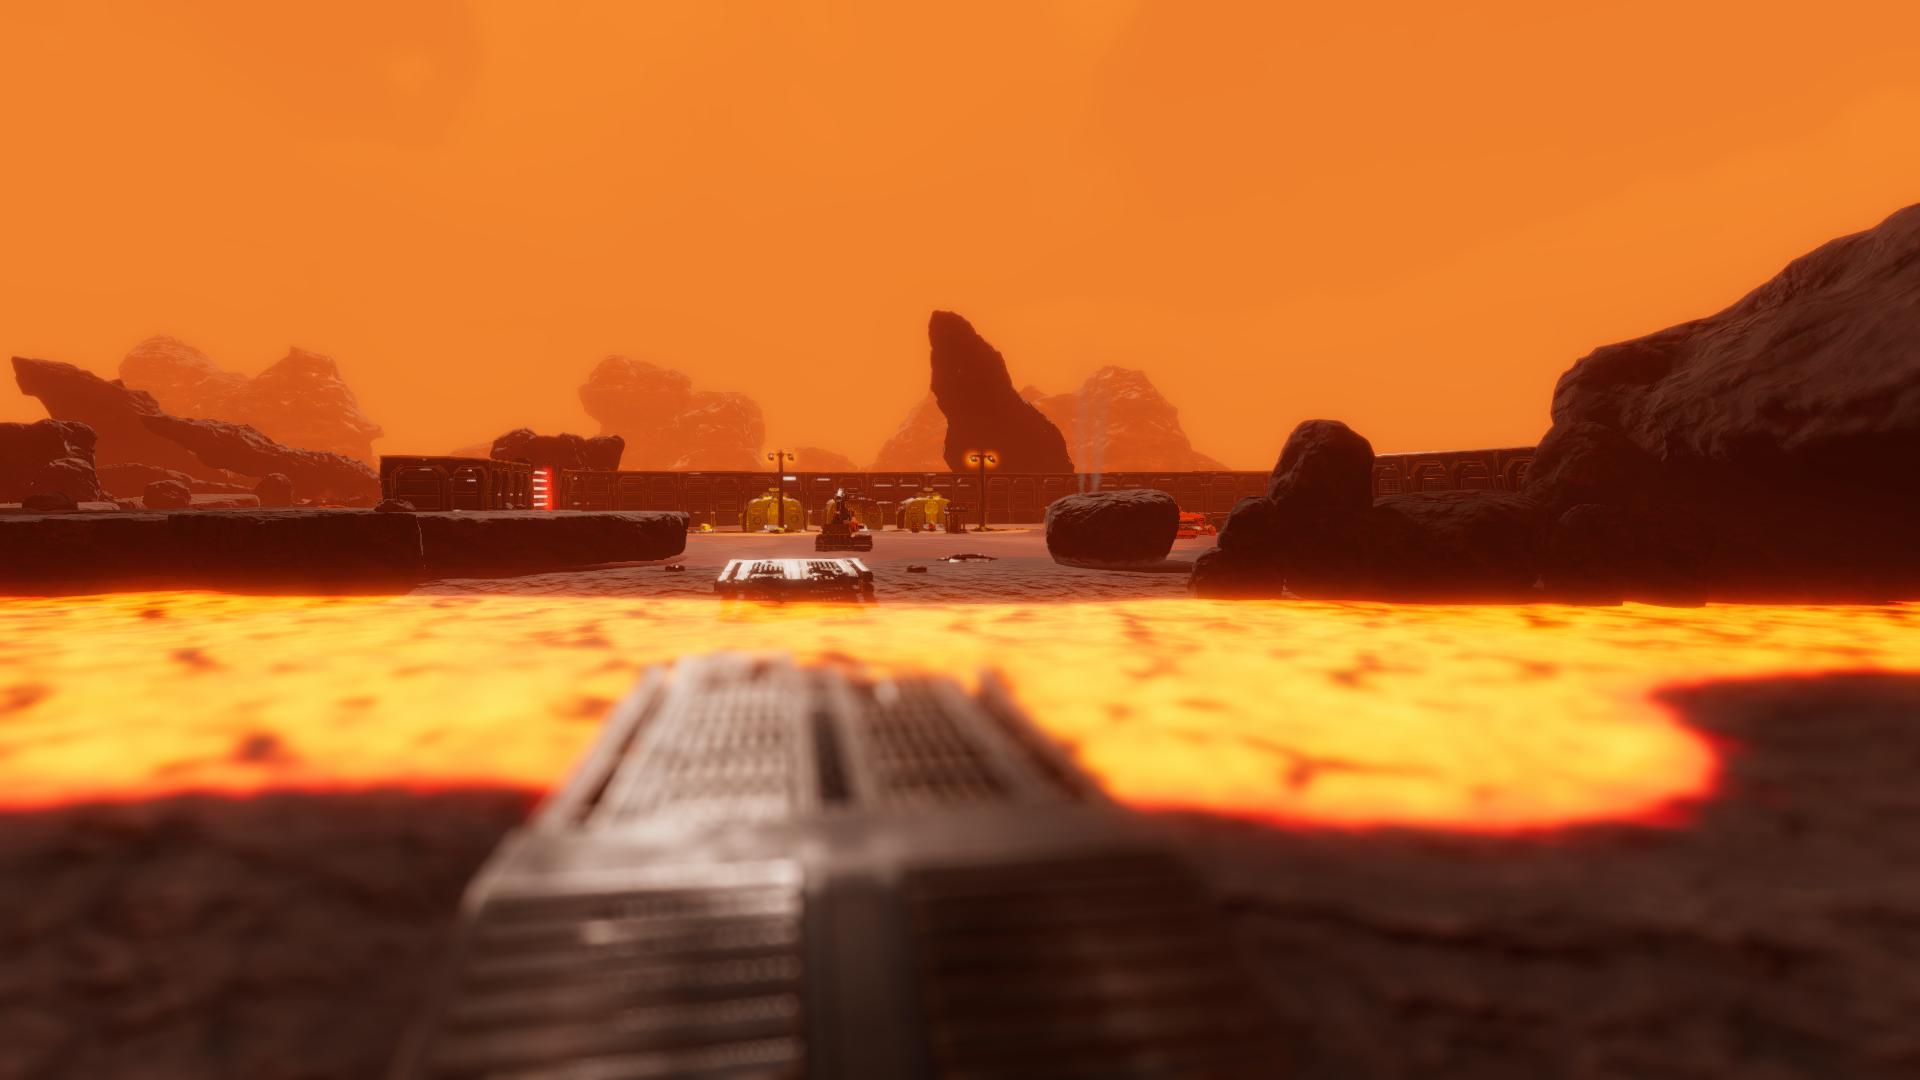 Infinite Desolation 5